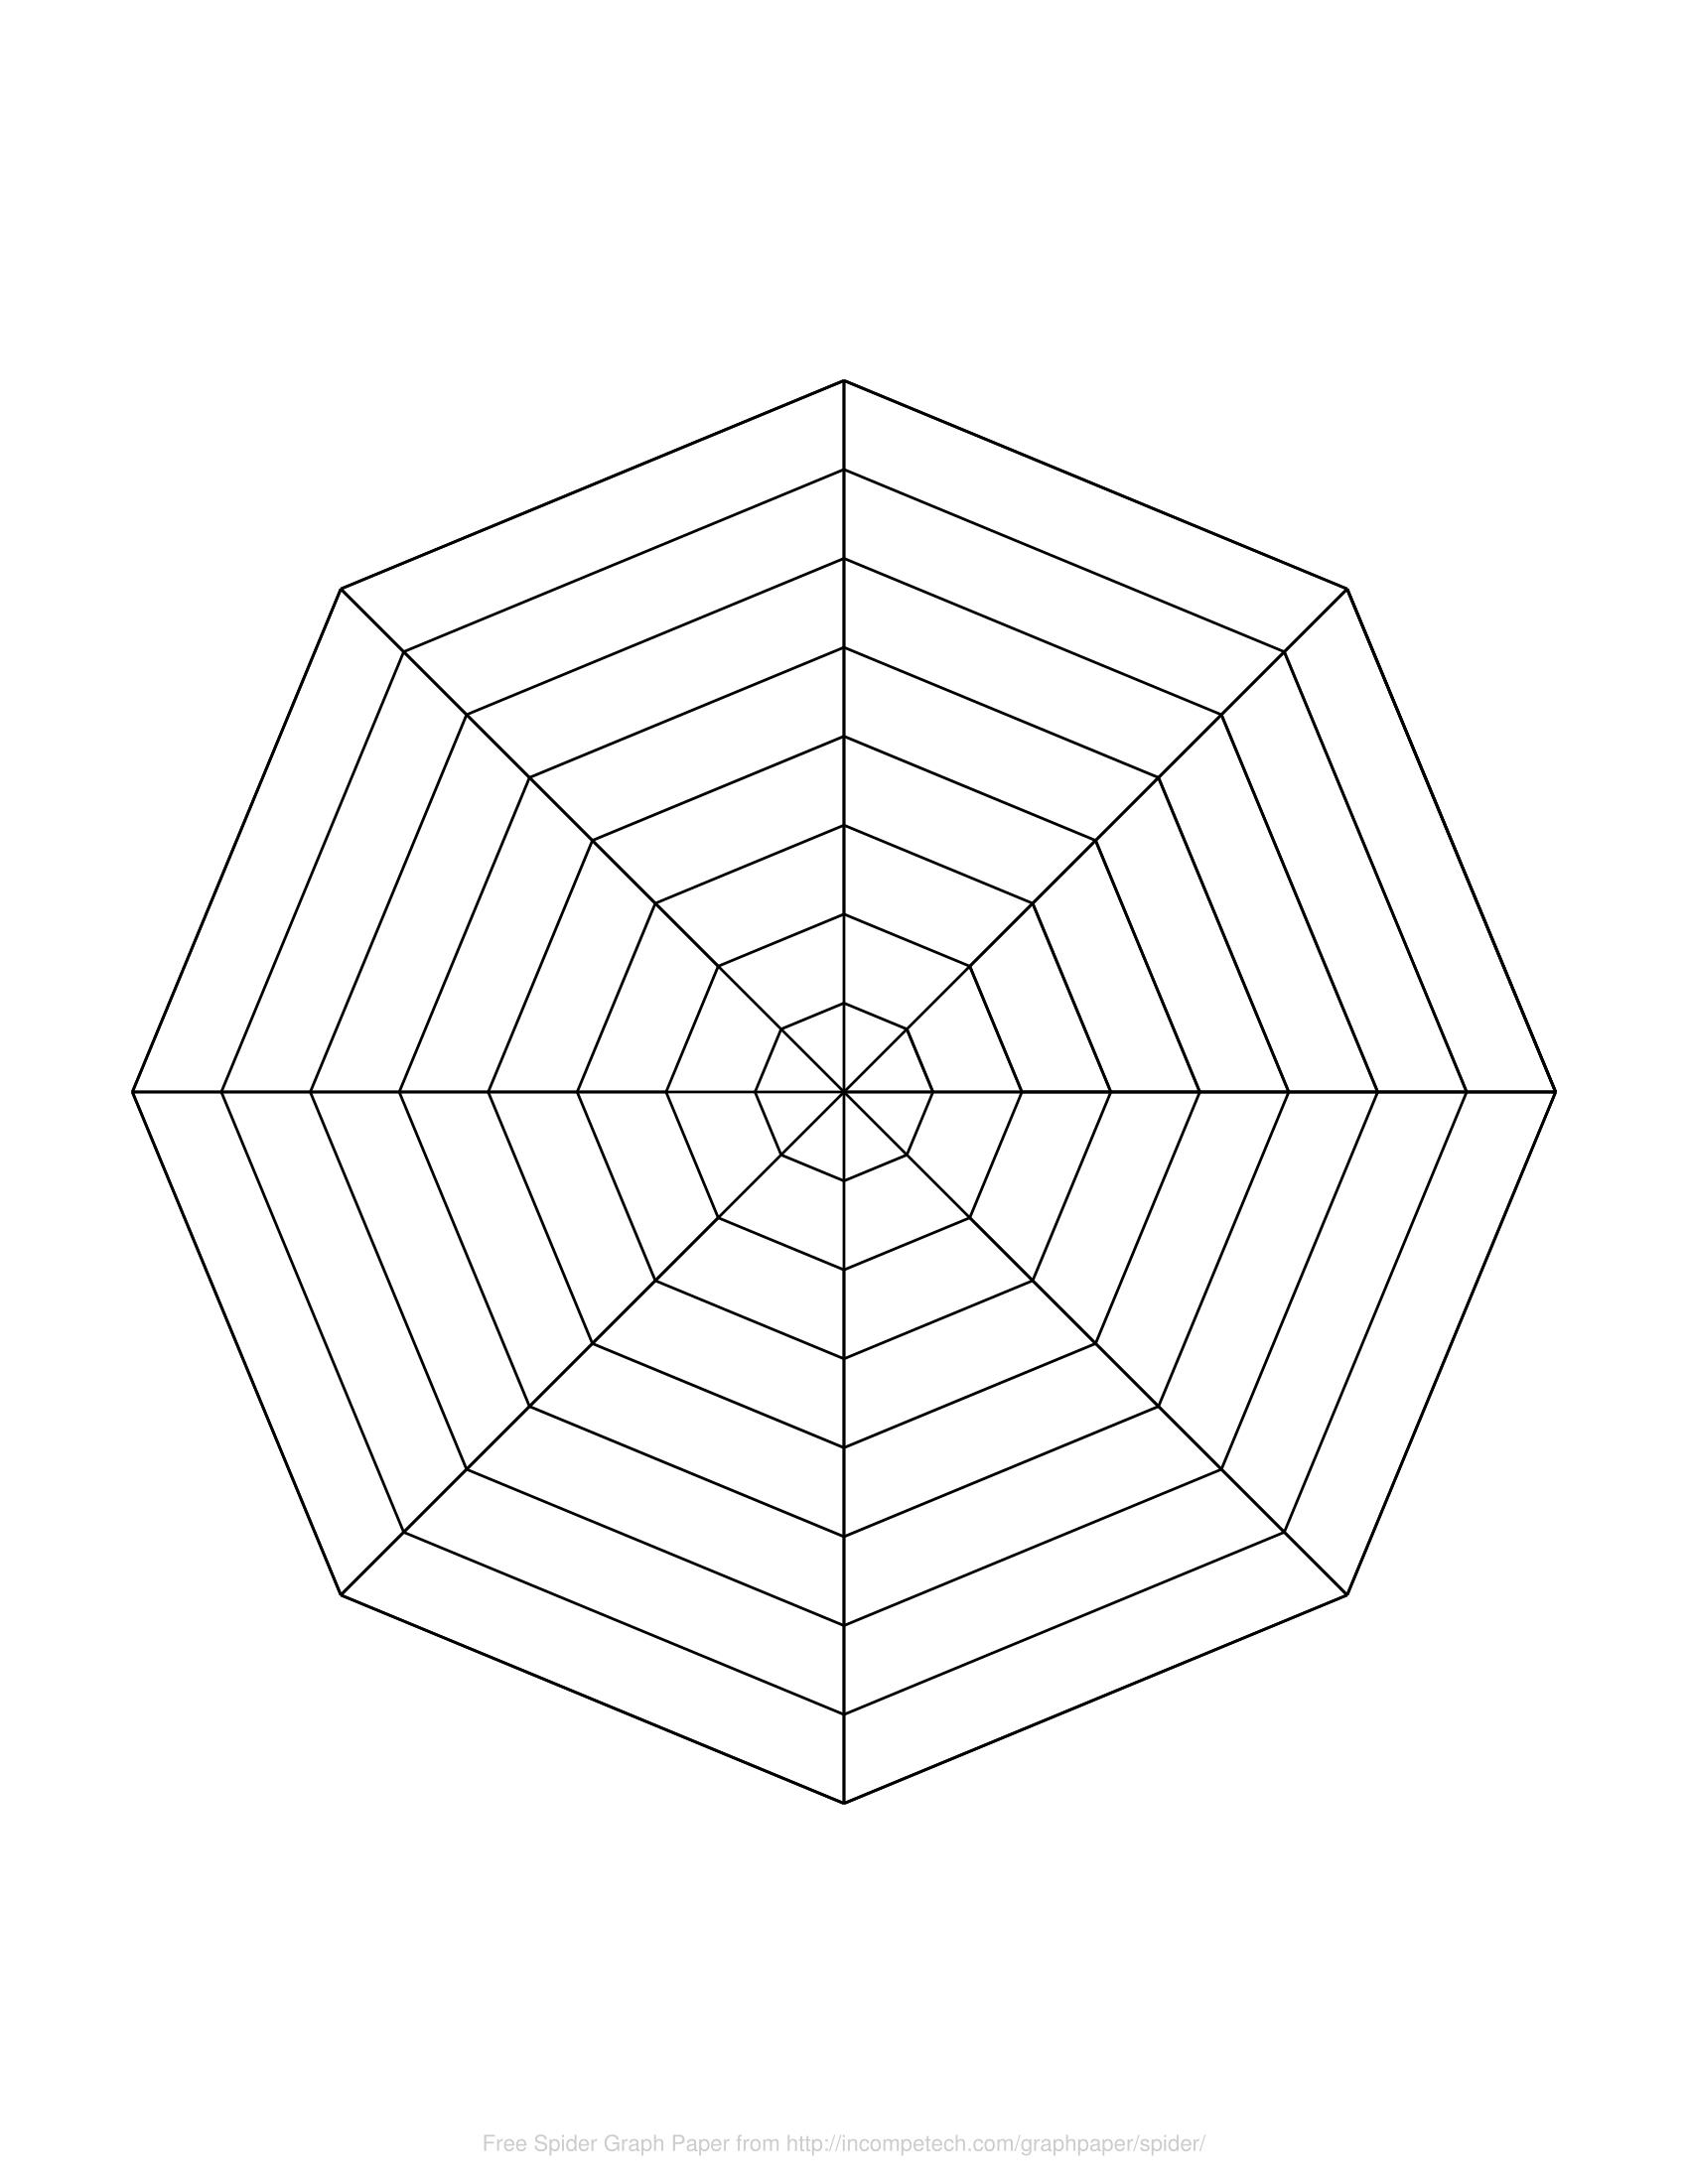 Free Online Graph Paper / Spider Regarding Blank Radar Chart Template